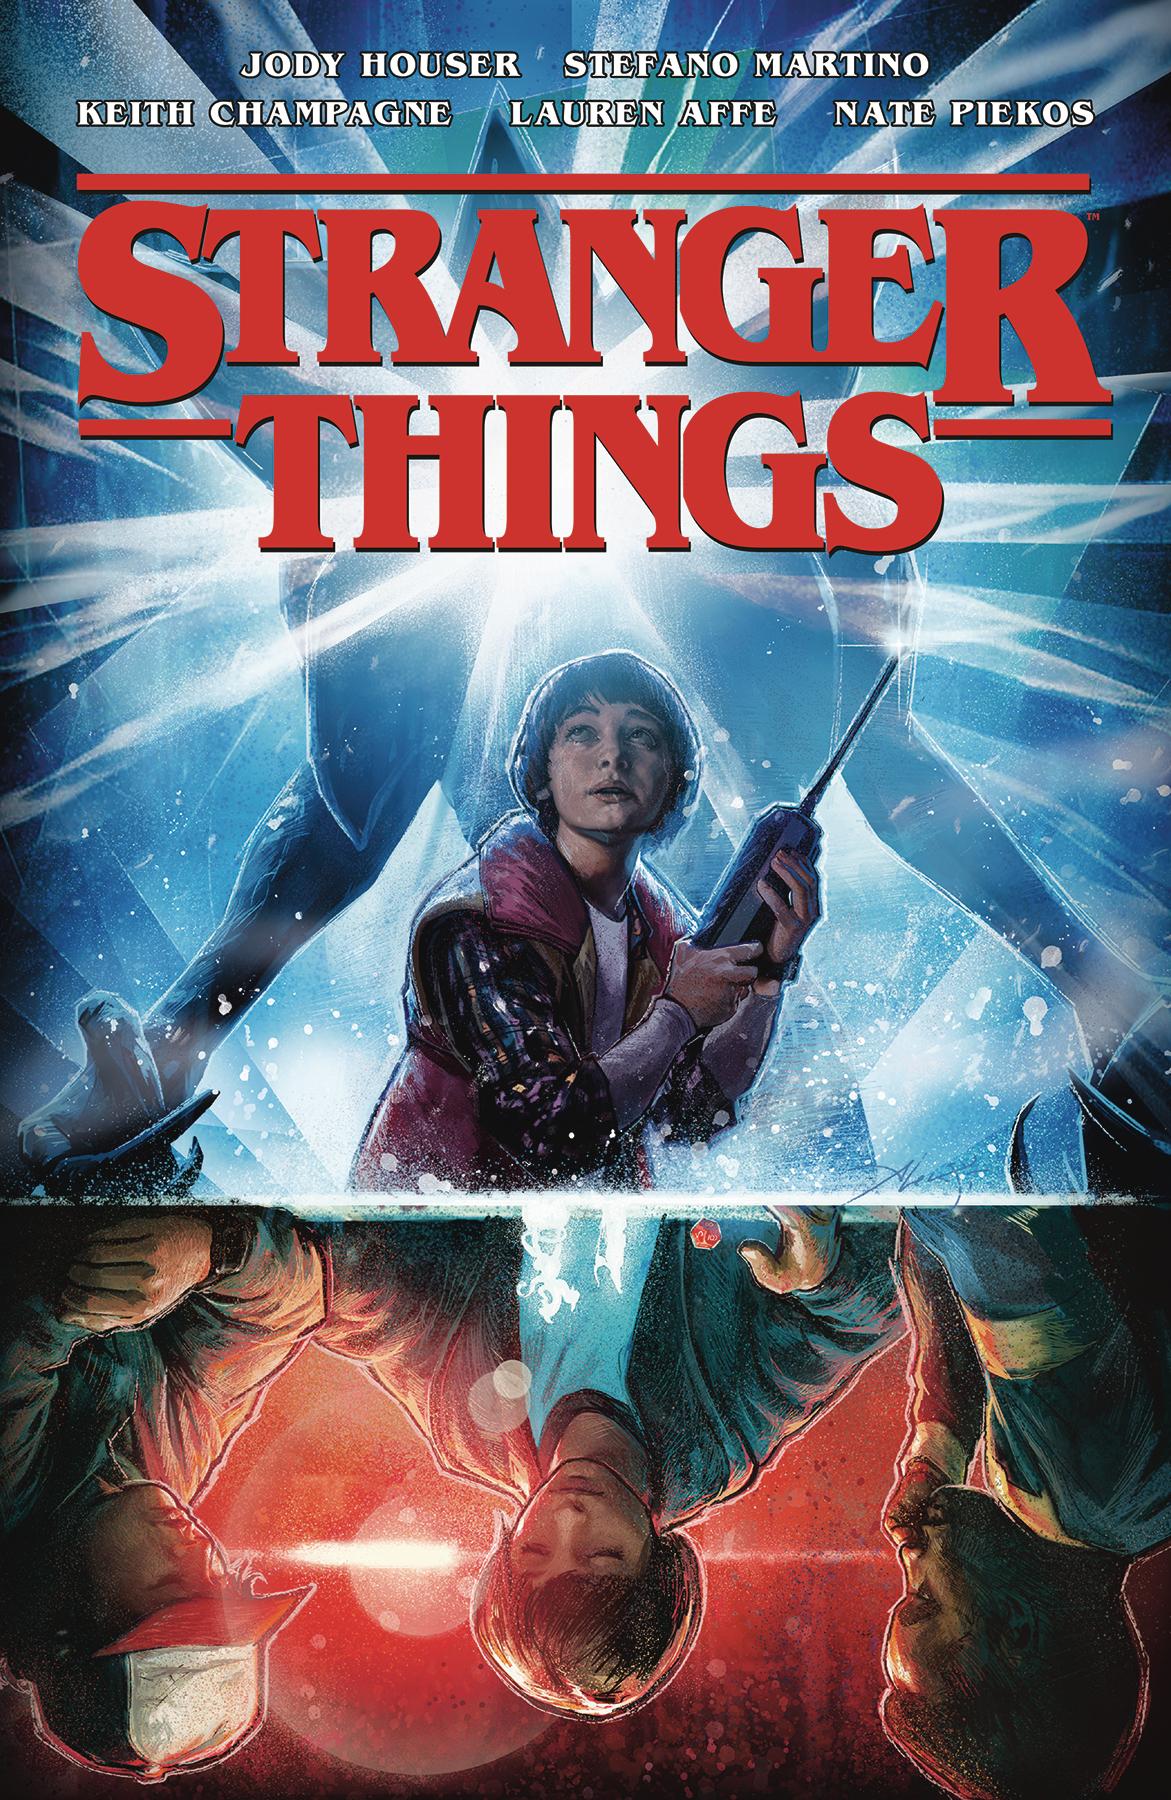 Stranger Things Other Side Trade Paperback Volume 01